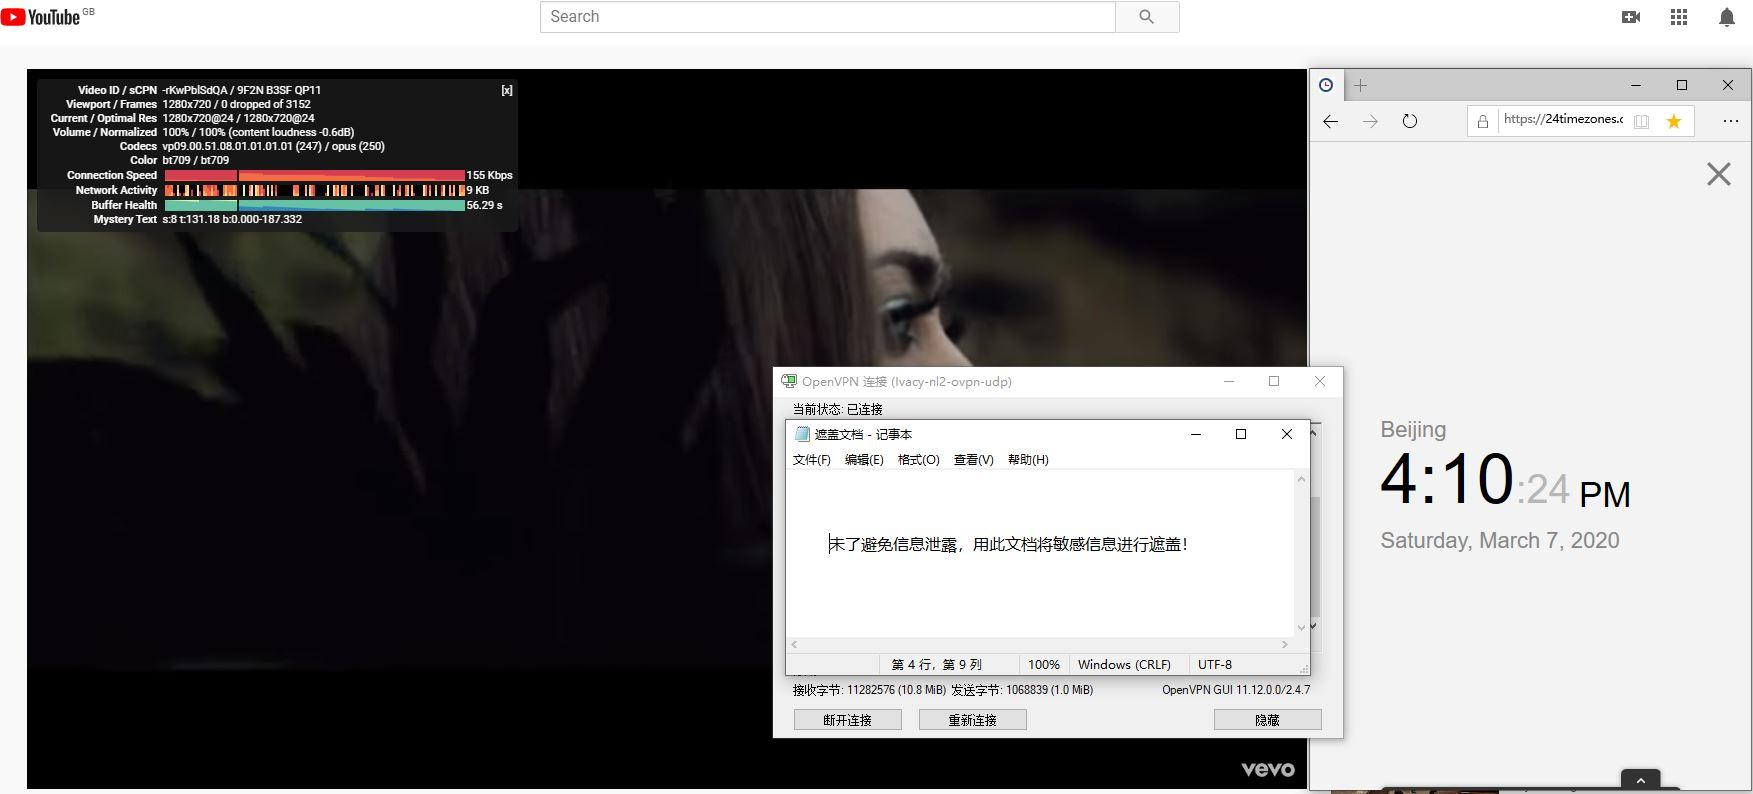 Windows10 IvacyVPN OpenVPN NL2 中国VPN翻墙 科学上网 Youtube测速 - 20200307